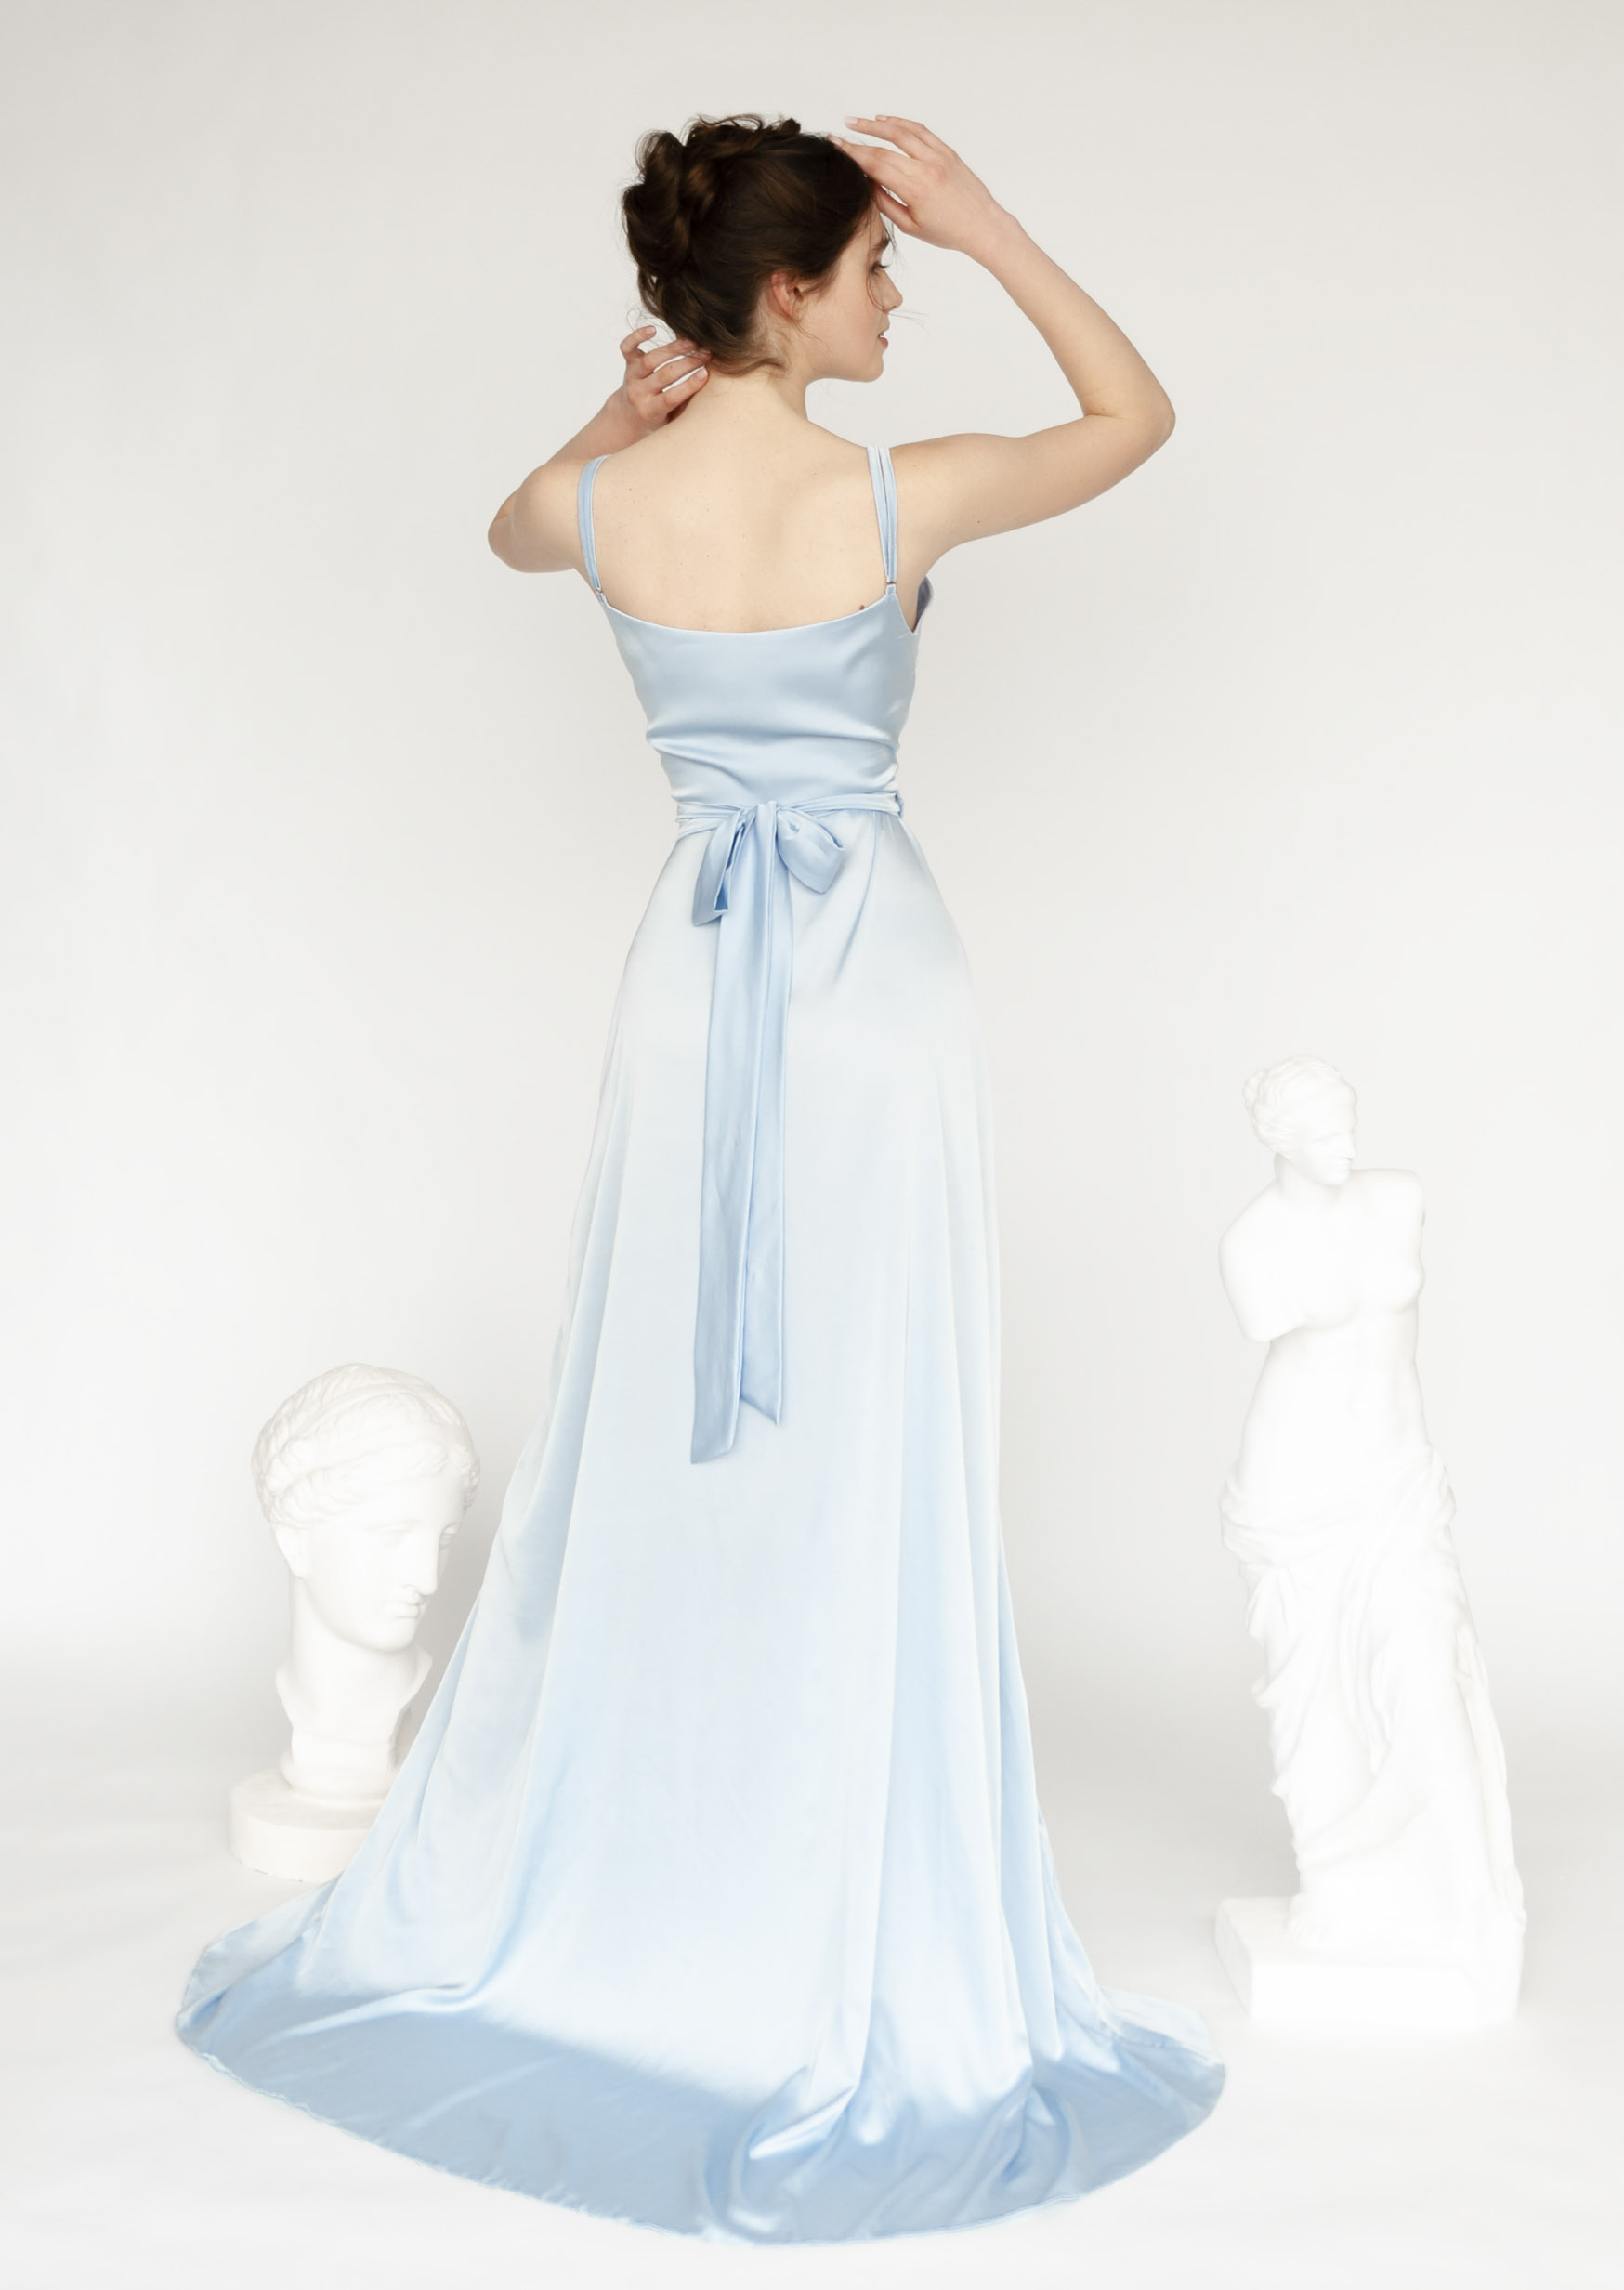 Sky blue dress long wrap halter slip bridesmaid dress